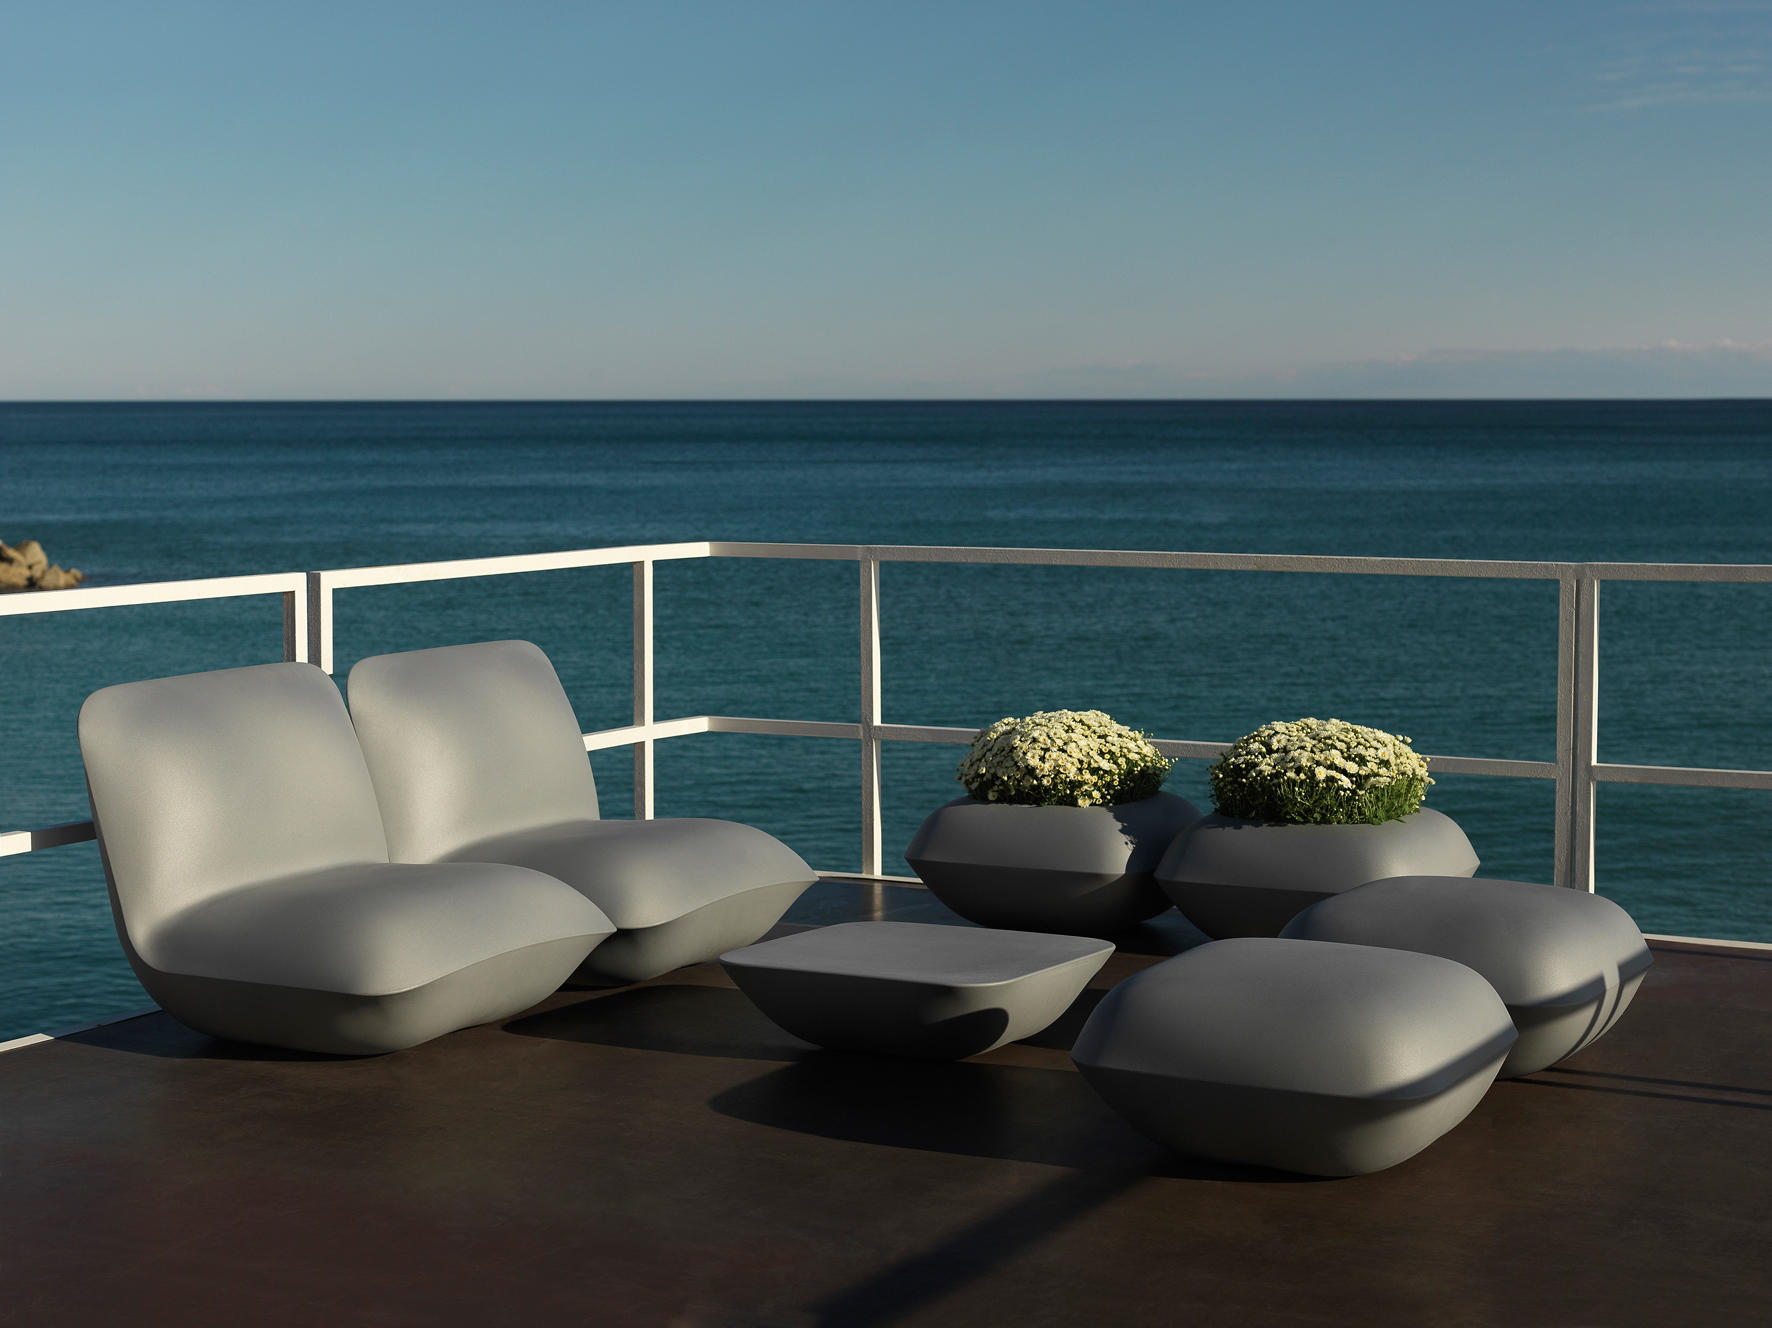 Pillow lounge chair by vondom